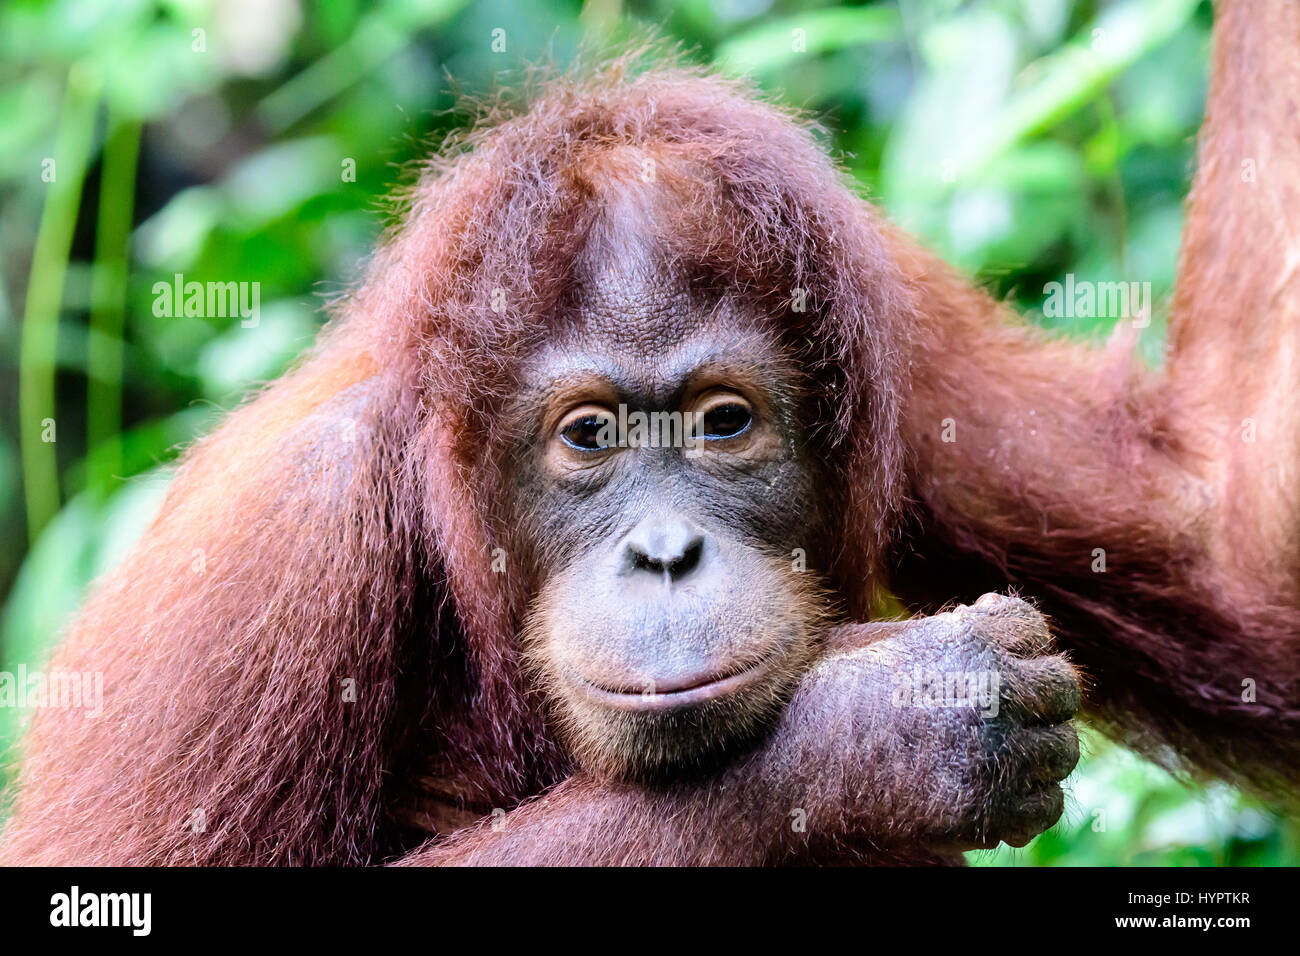 Head shot d'un orang-outan intelligemment regarder curieux Photo Stock